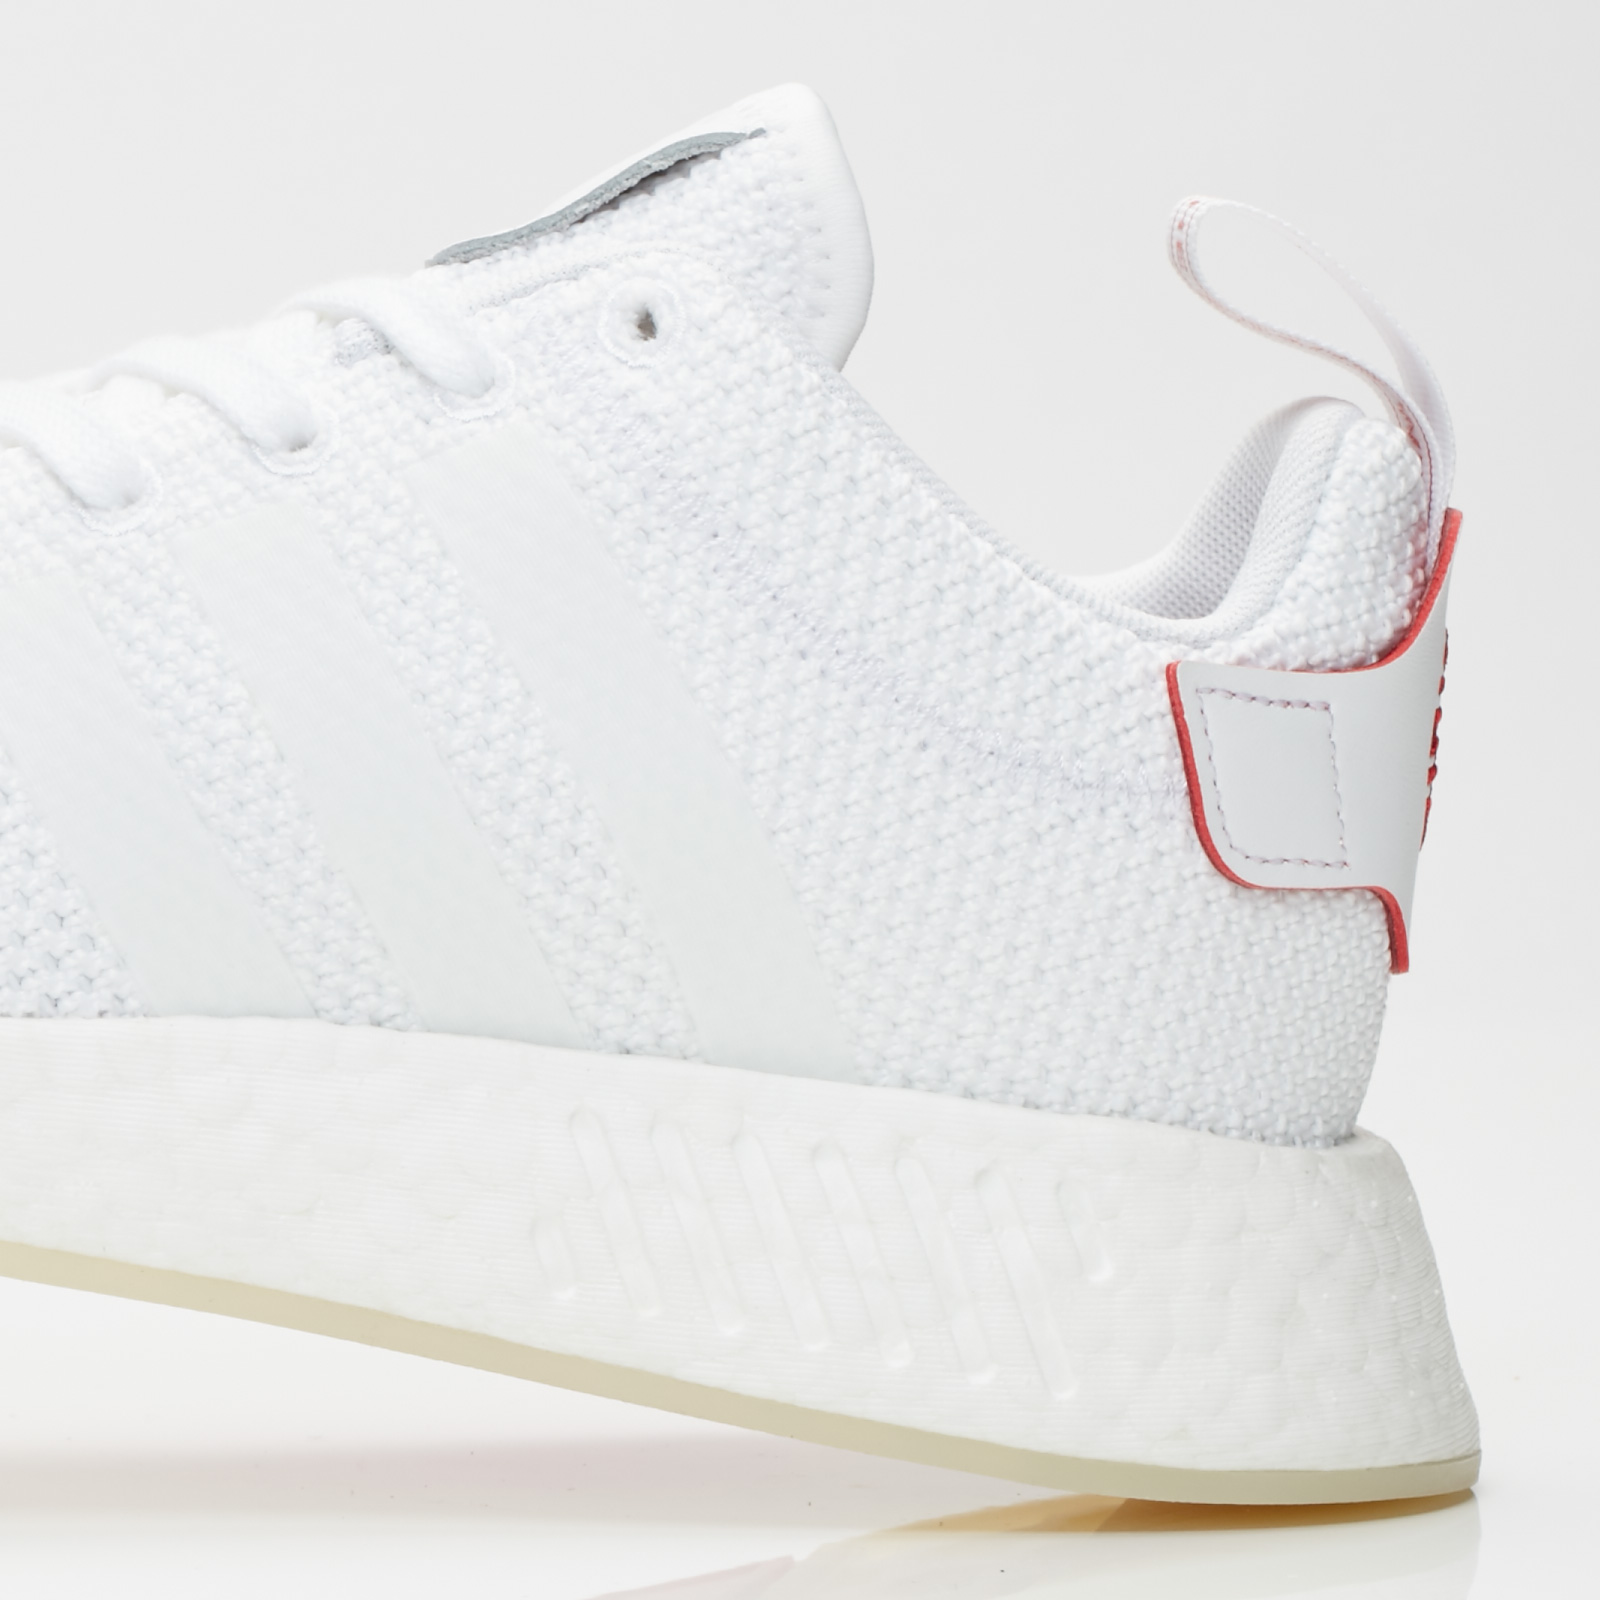 8b02b9462023c adidas NMD R2 Chinese New Year - Db2570 - Sneakersnstuff